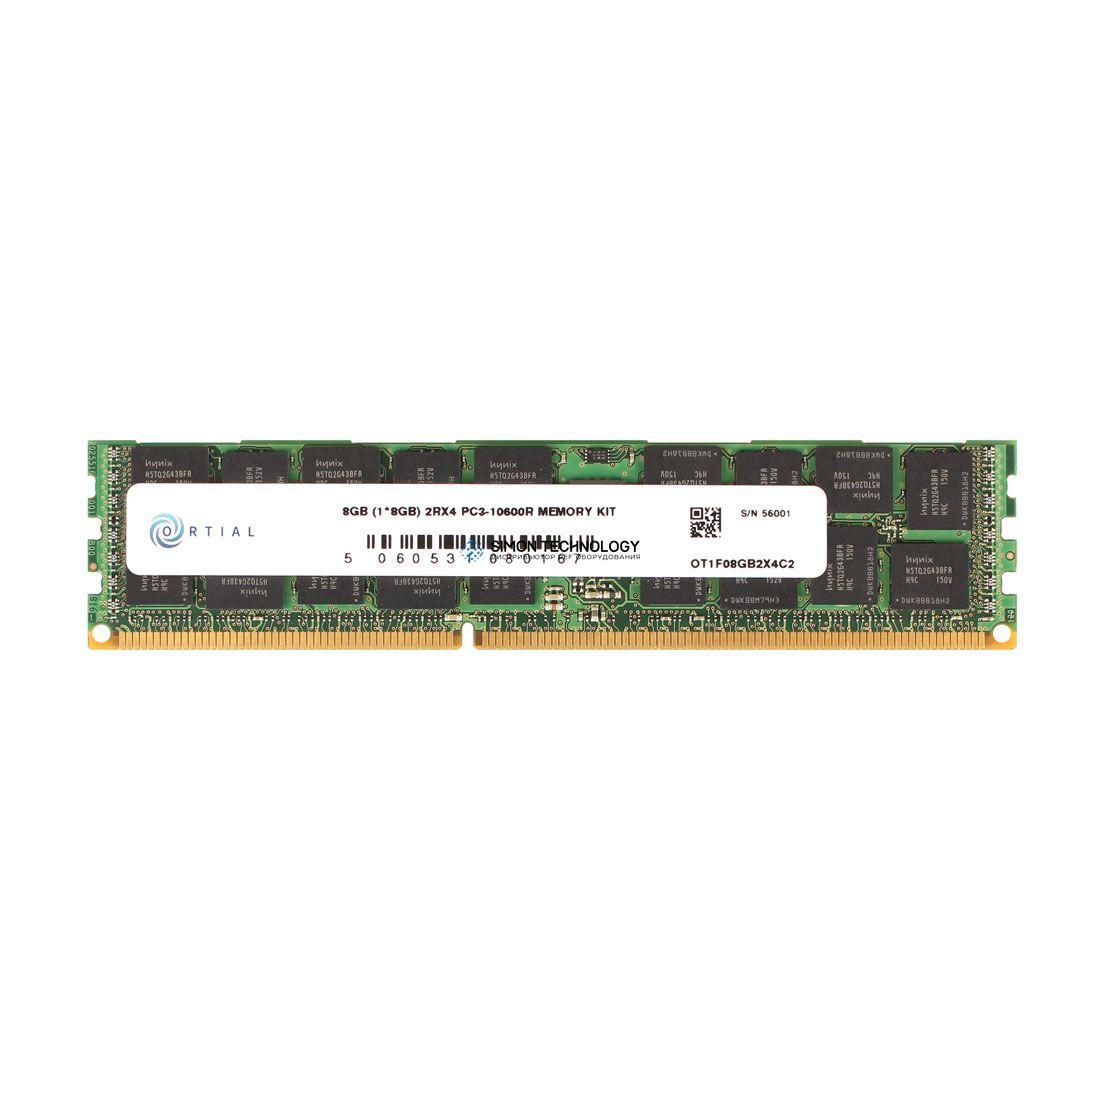 Оперативная память Ortial 8GB (1*8GB) 2RX4 PC3-10600R MEMORY KIT *LIFETIME WNTY* (43X5056-OT)